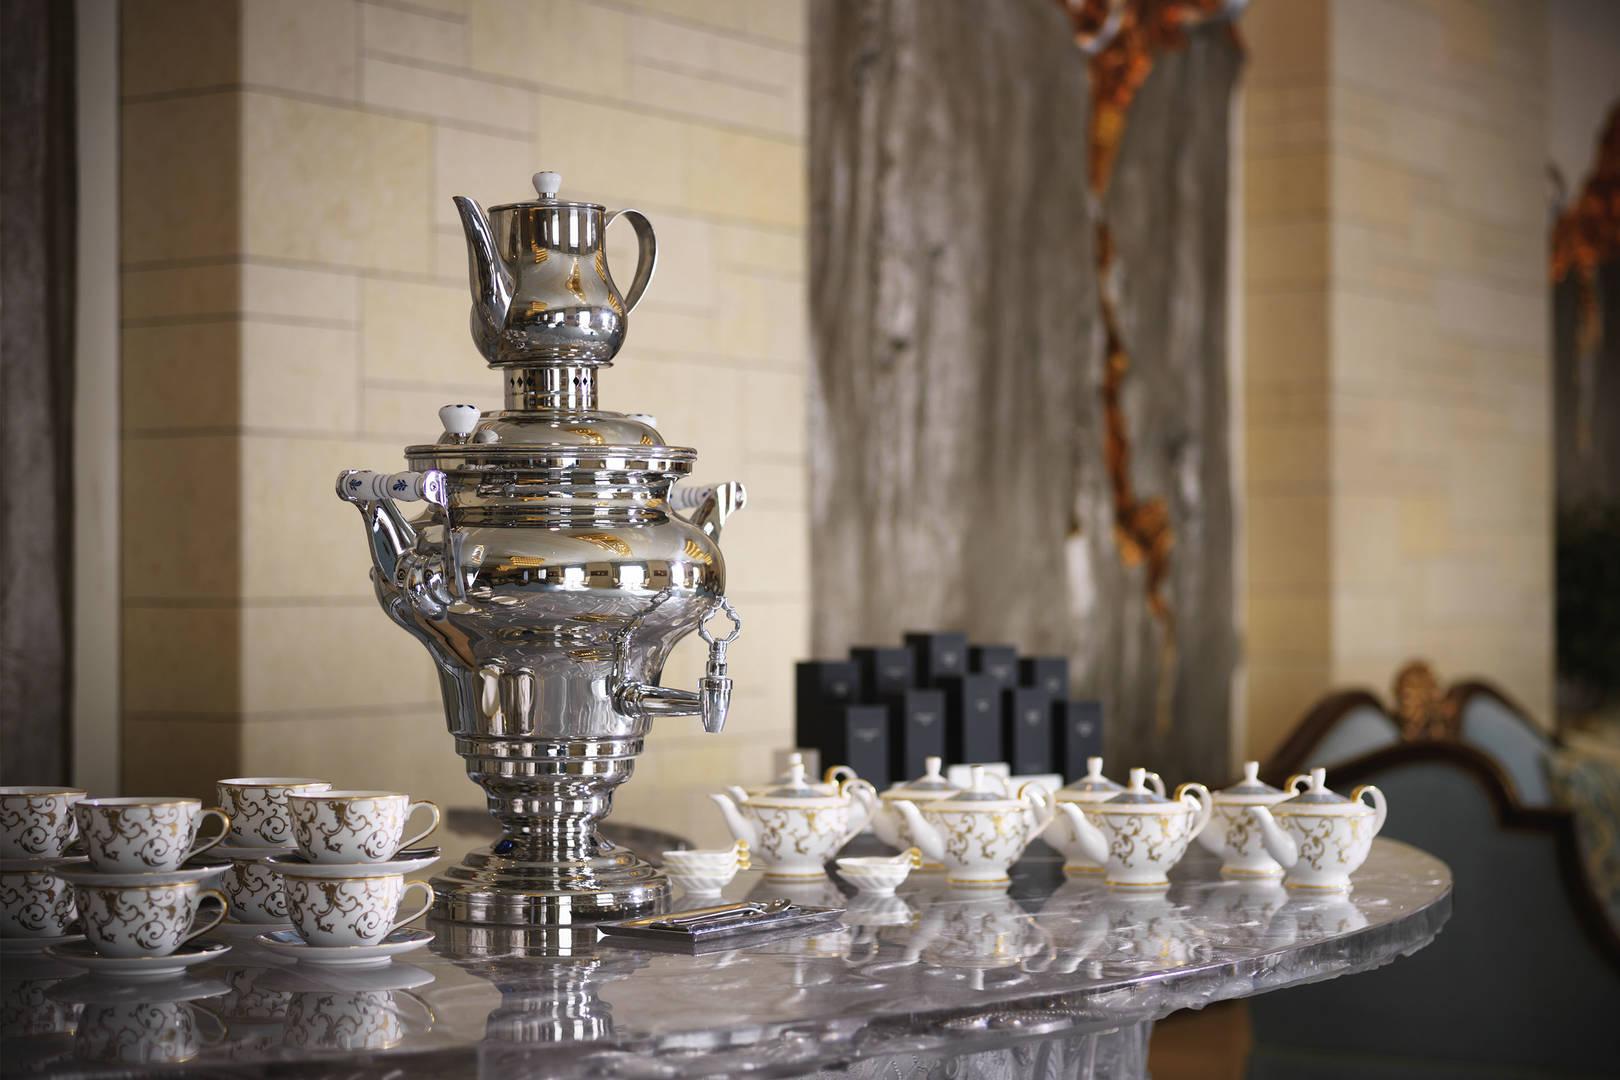 https://cdn.jumeirah.com/-/mediadh/DH/Hospitality/Jumeirah/Restaurants/Kuwait/Messilah-Tea-Lounge/Restaurant-Gallery/Jumeirah-Messilah-Beach-Hotel--Spa--Tea-Lounge64.jpg?h=1080&w=1620&hash=CE75508AFF4732550388DEC702688A60